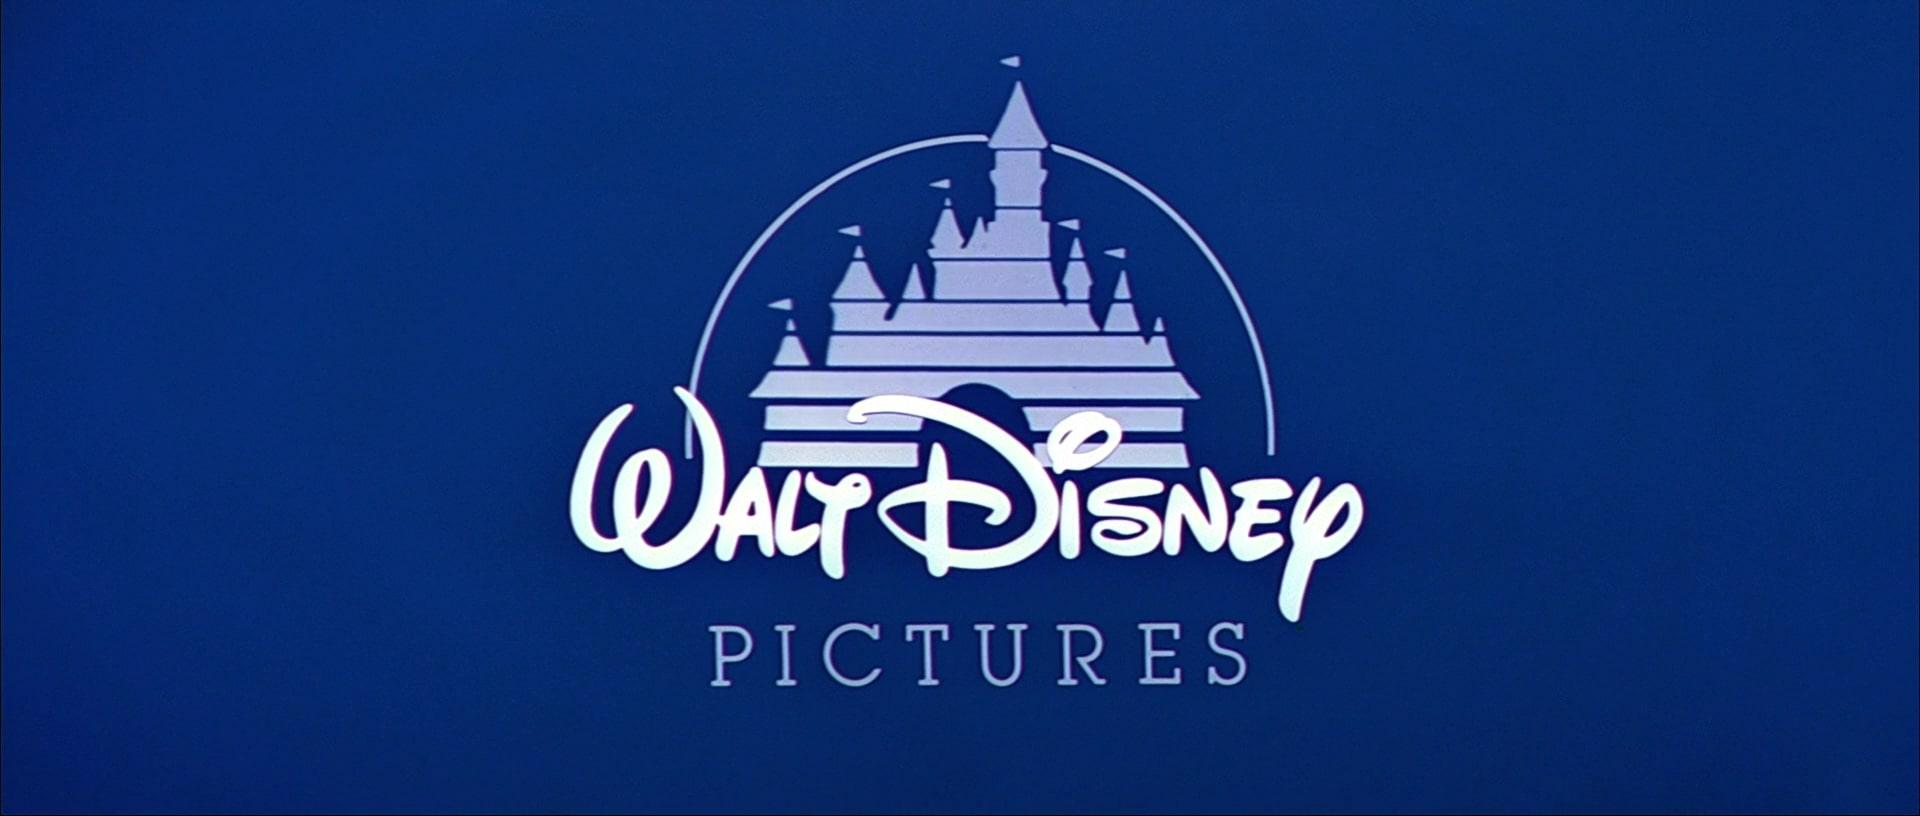 File:Disney1985.jpg